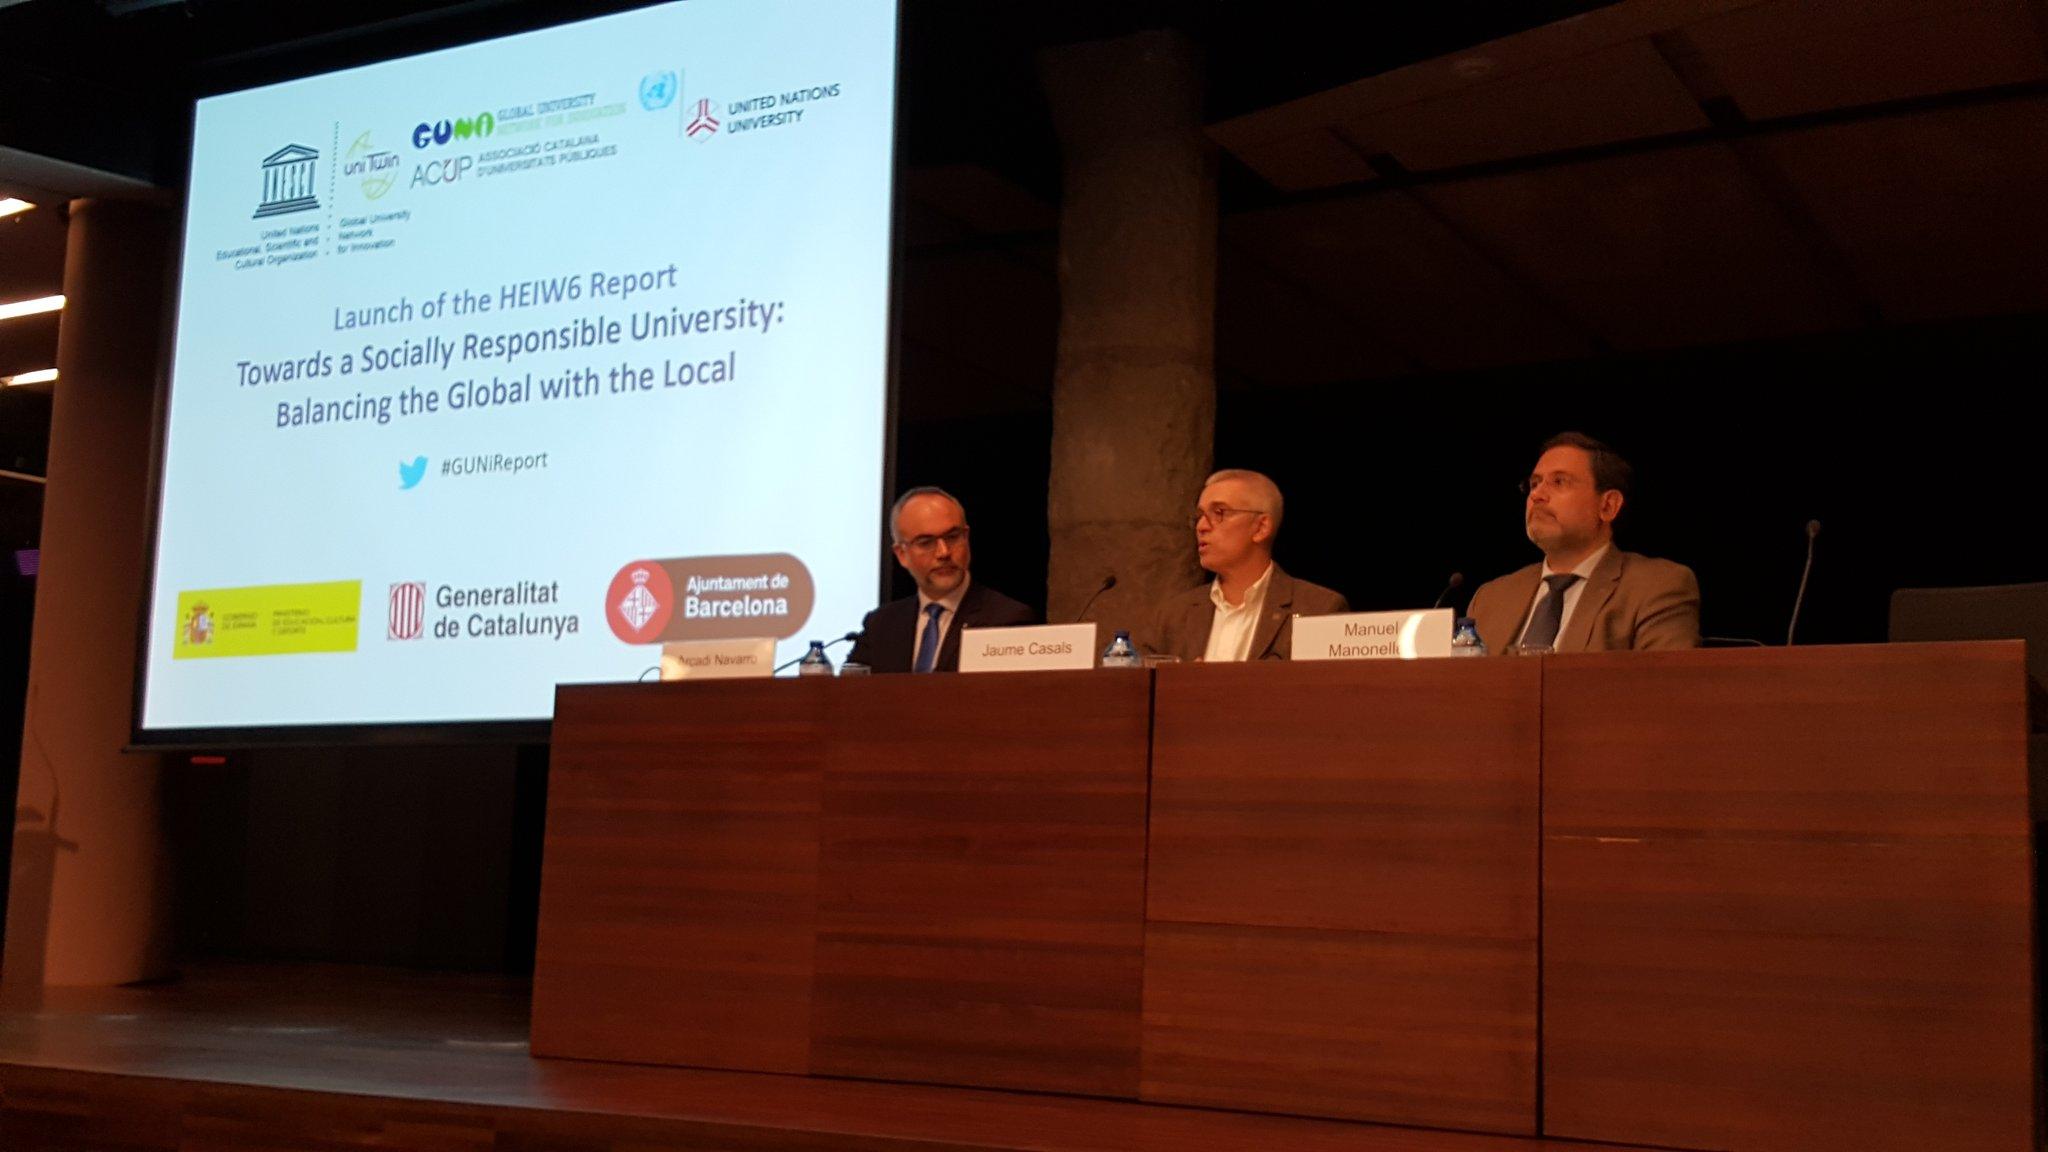 Comienza el acto de la Global University Network for Innovation en La Pedrera. #GUNireport https://t.co/DNNhaFjPVr